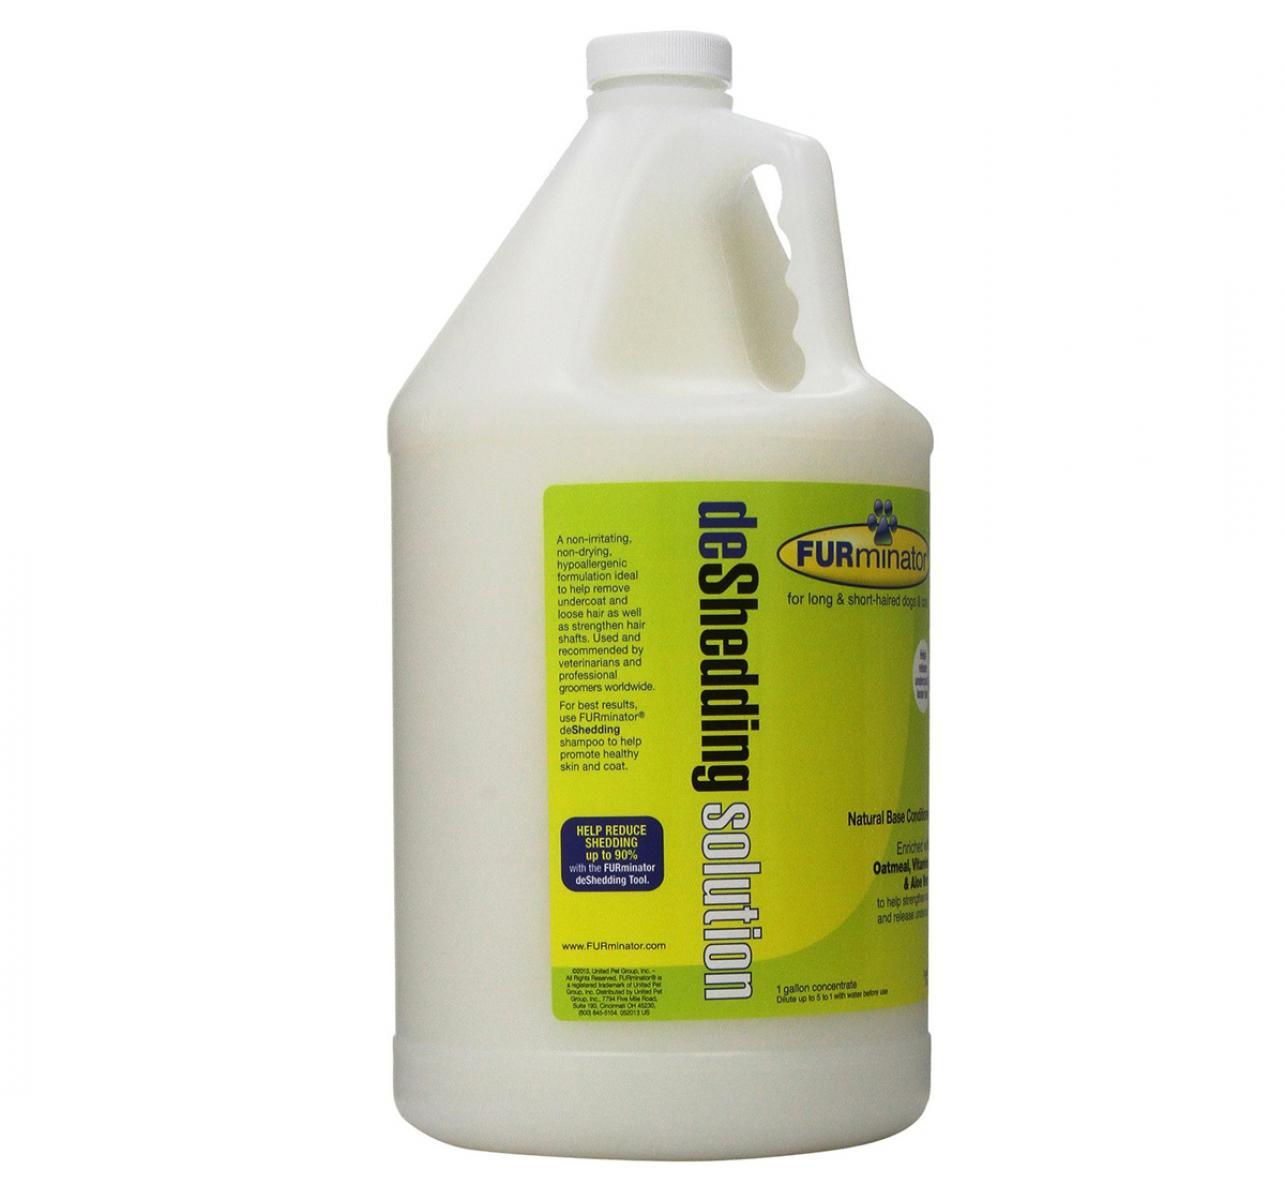 Furminator Deshedding Solution Shampoo - 3.8 Liters